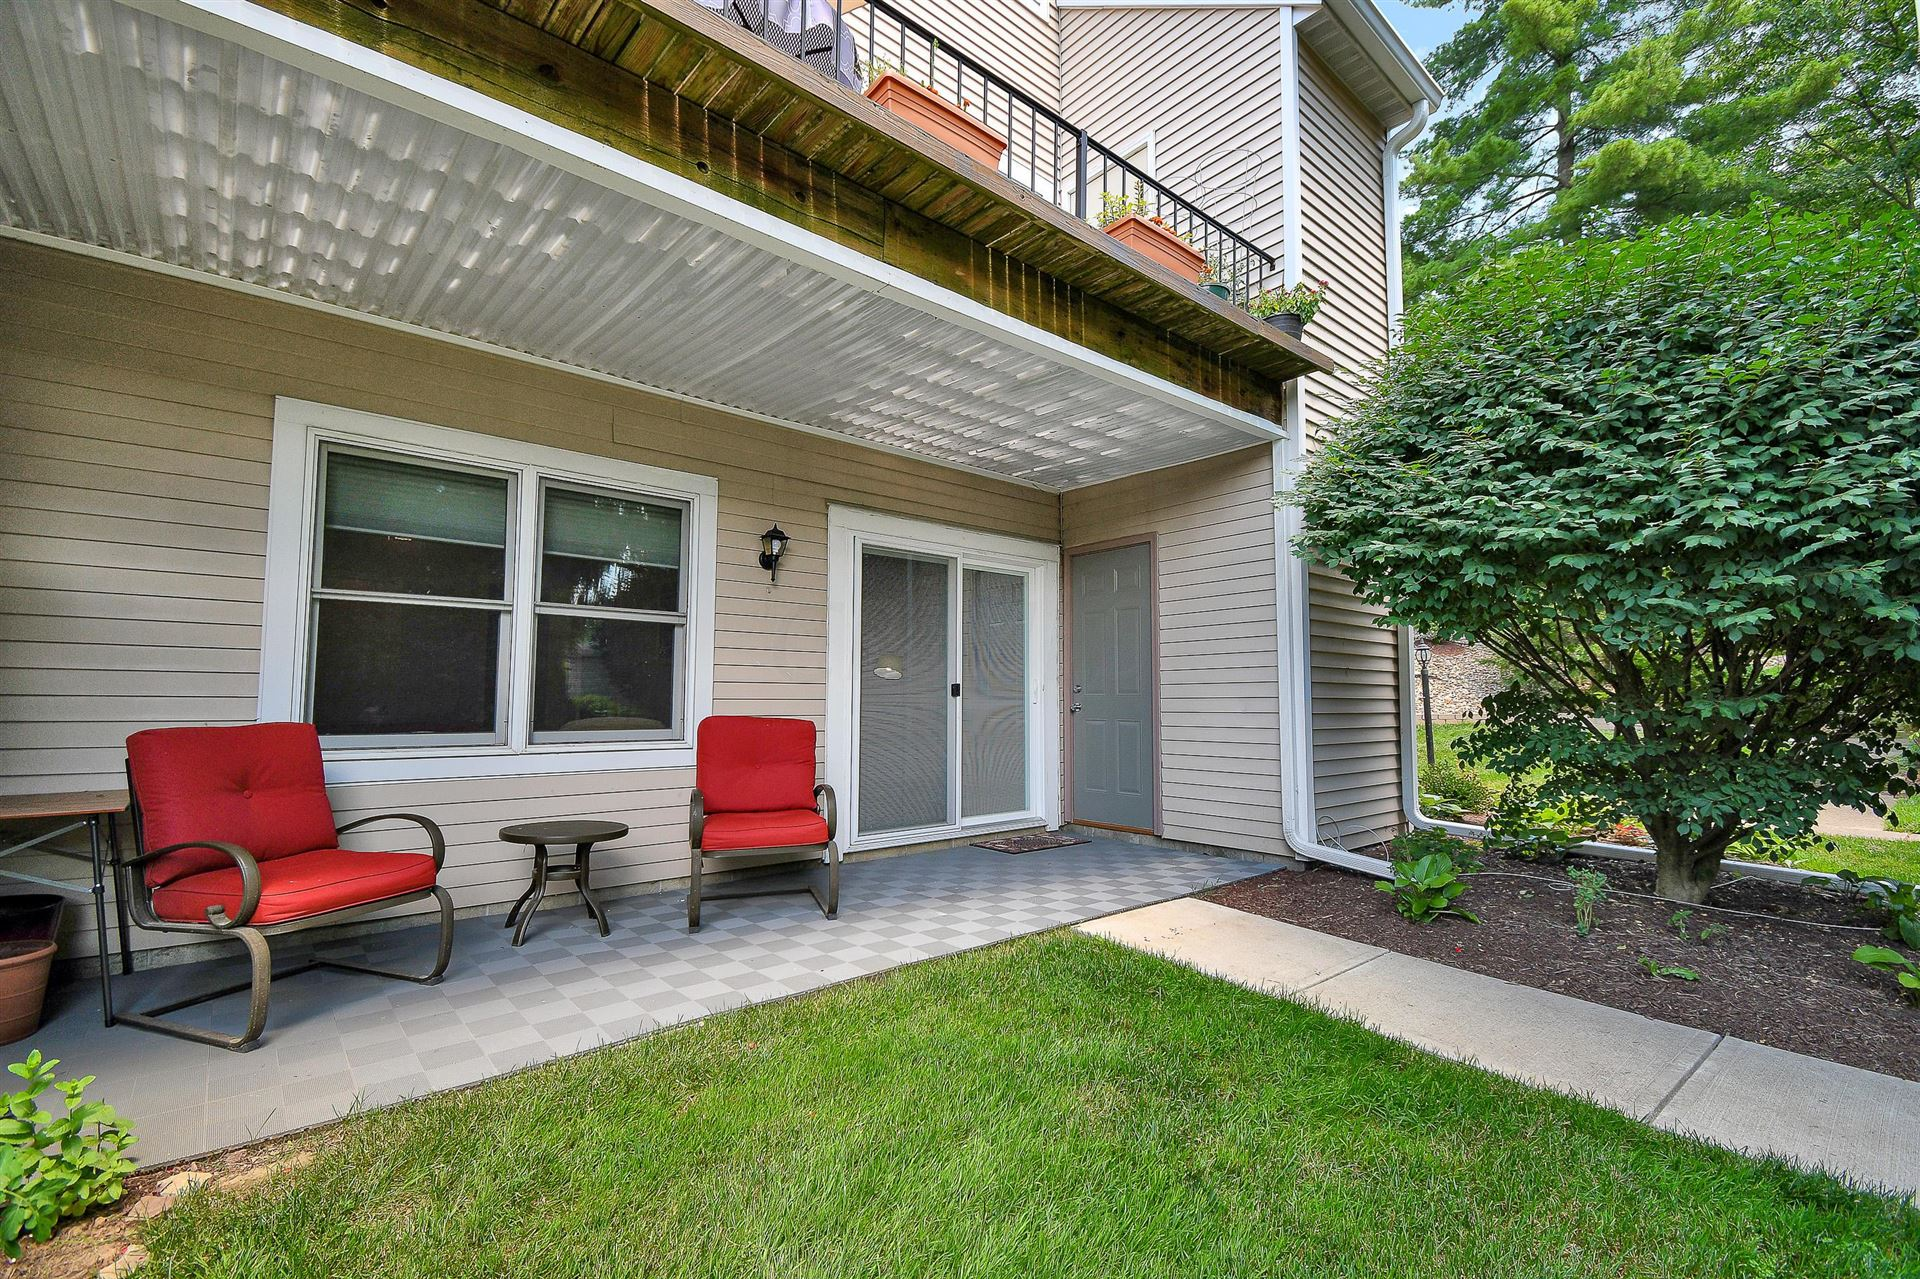 610 W Maple Street, Granville, OH 43023 - #: 220021634